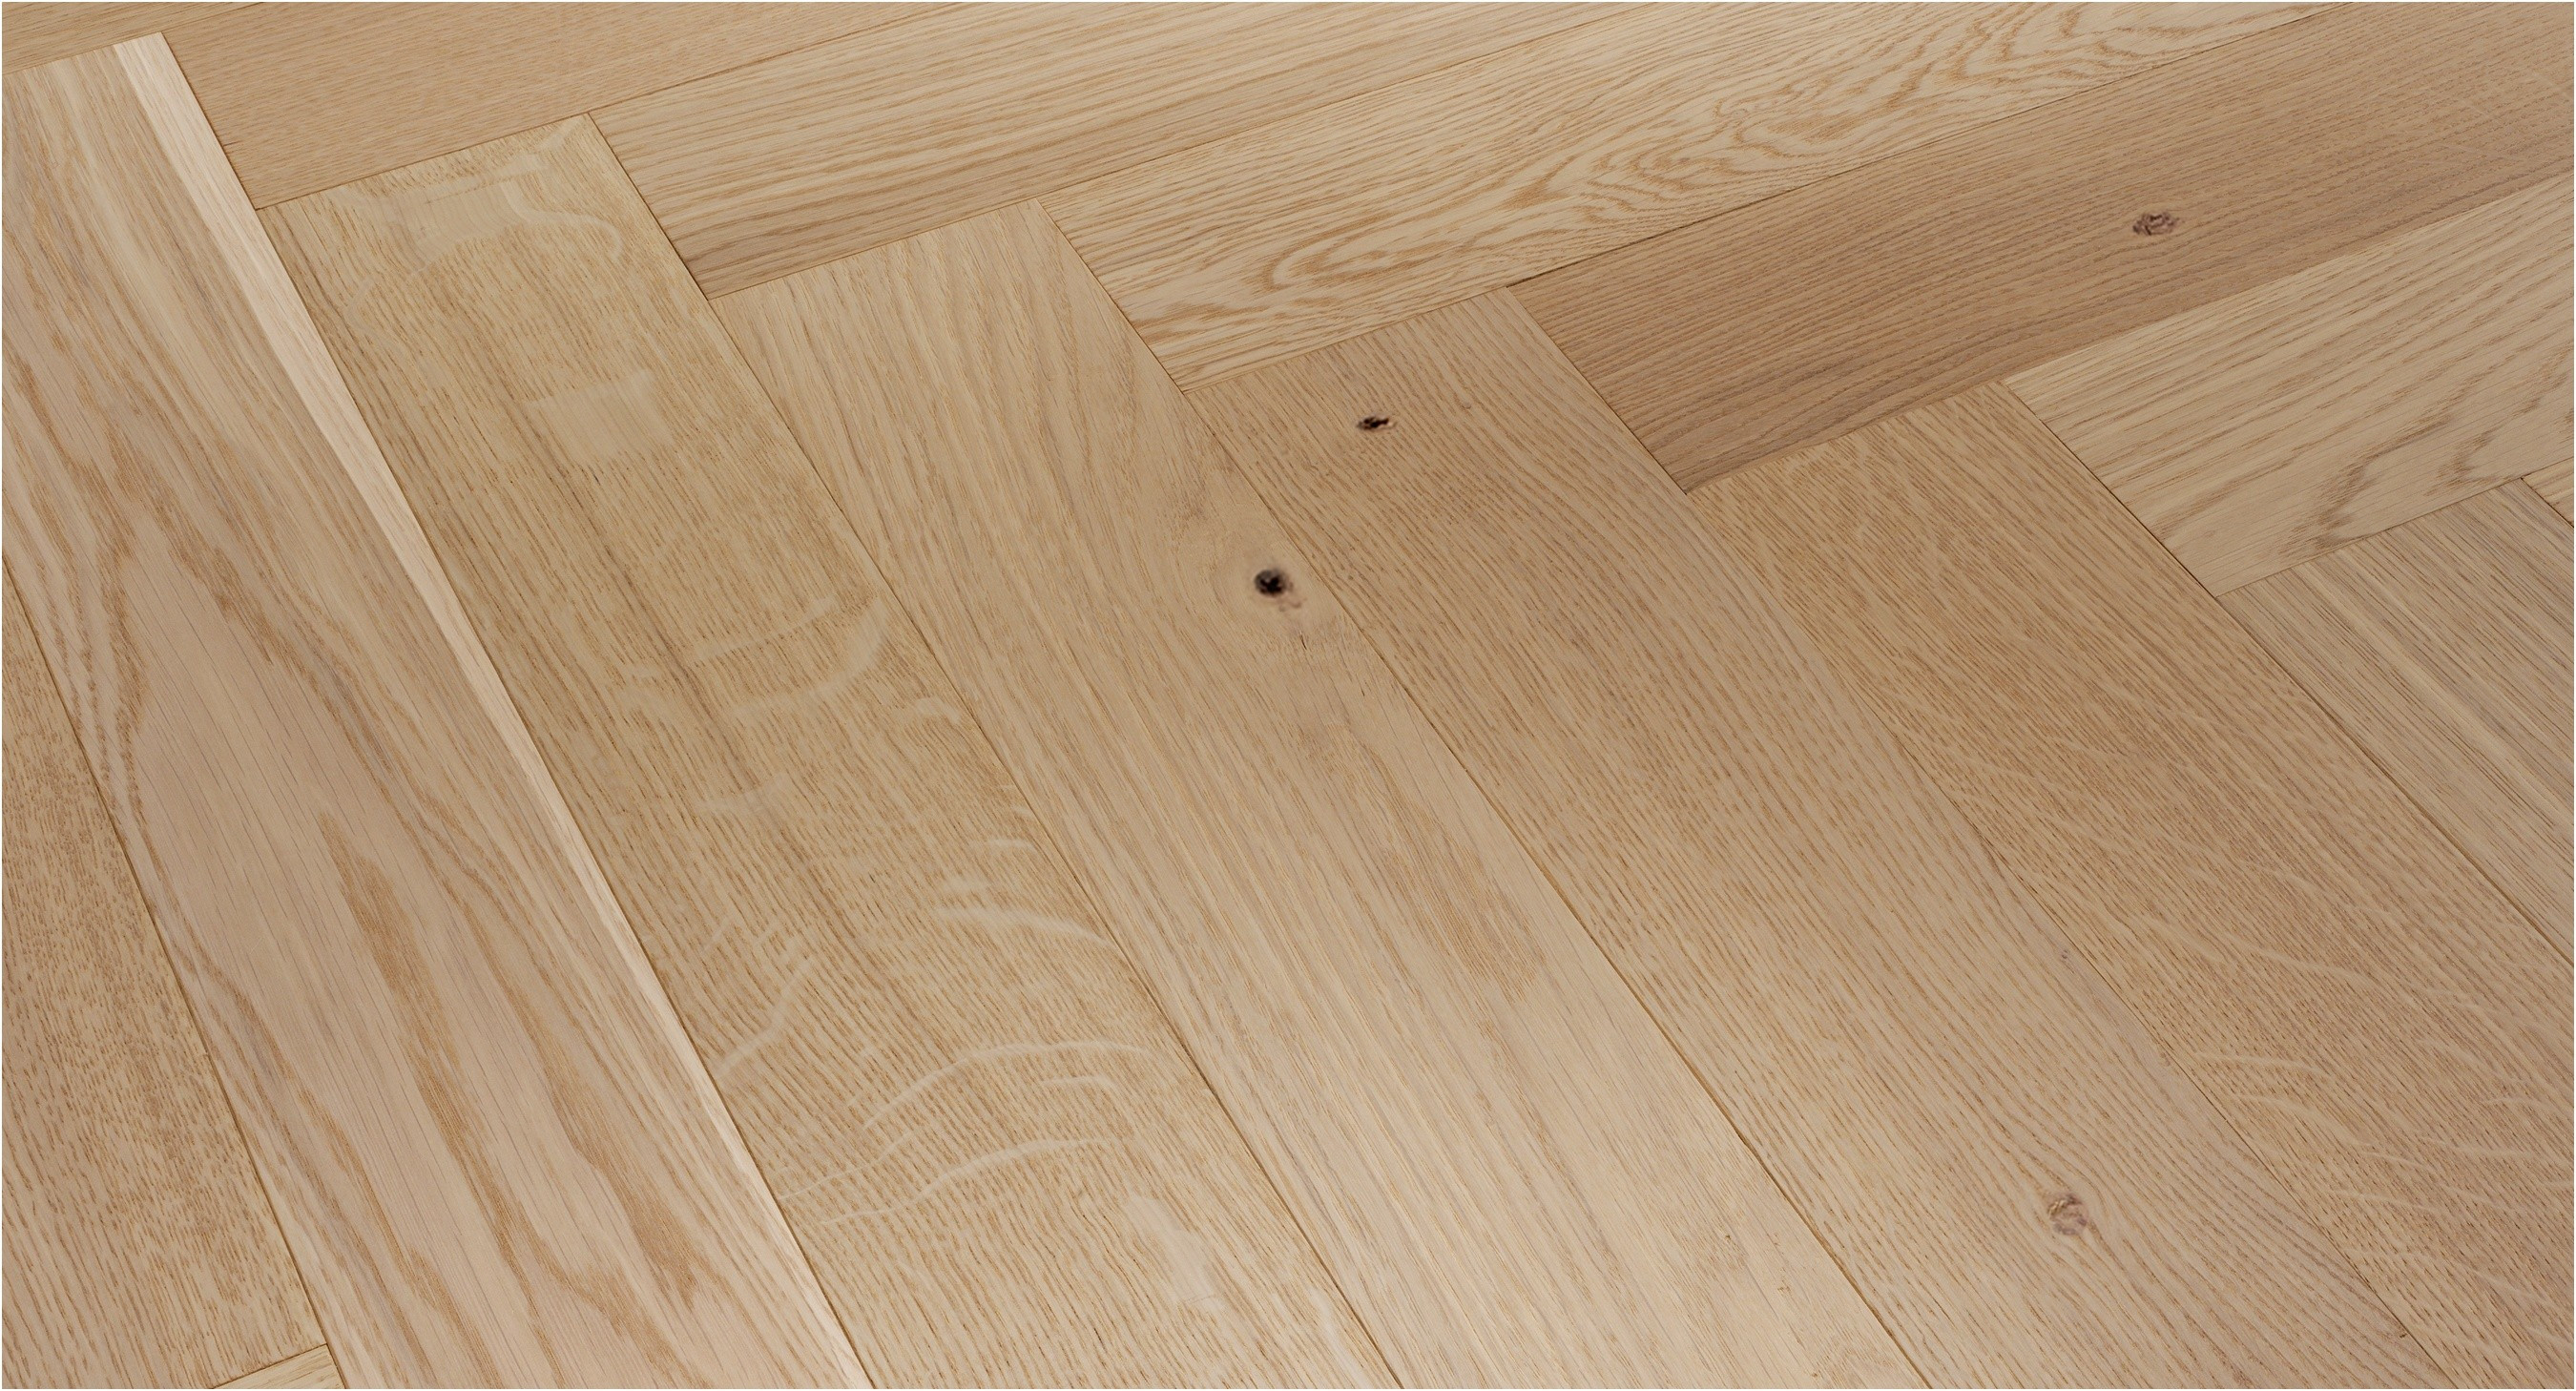 antique oak hardwood flooring of 19 awesome hardwood flooring for sale photograph dizpos com within hardwood flooring for sale awesome flooring sale near me stock 0d grace place barnegat nj photos